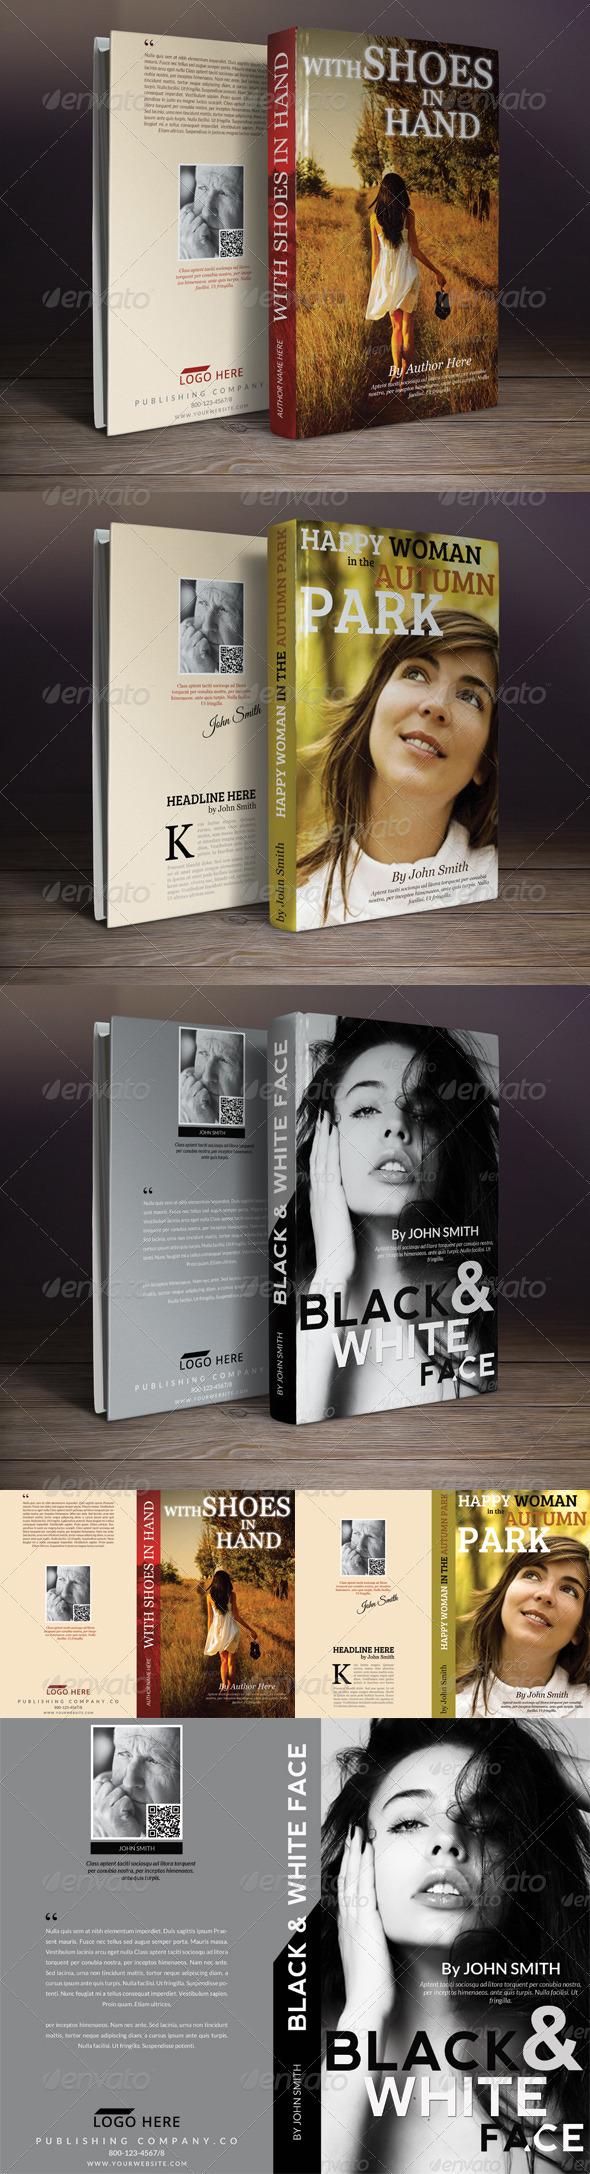 GraphicRiver Book Cover Templates Bundle 6554186